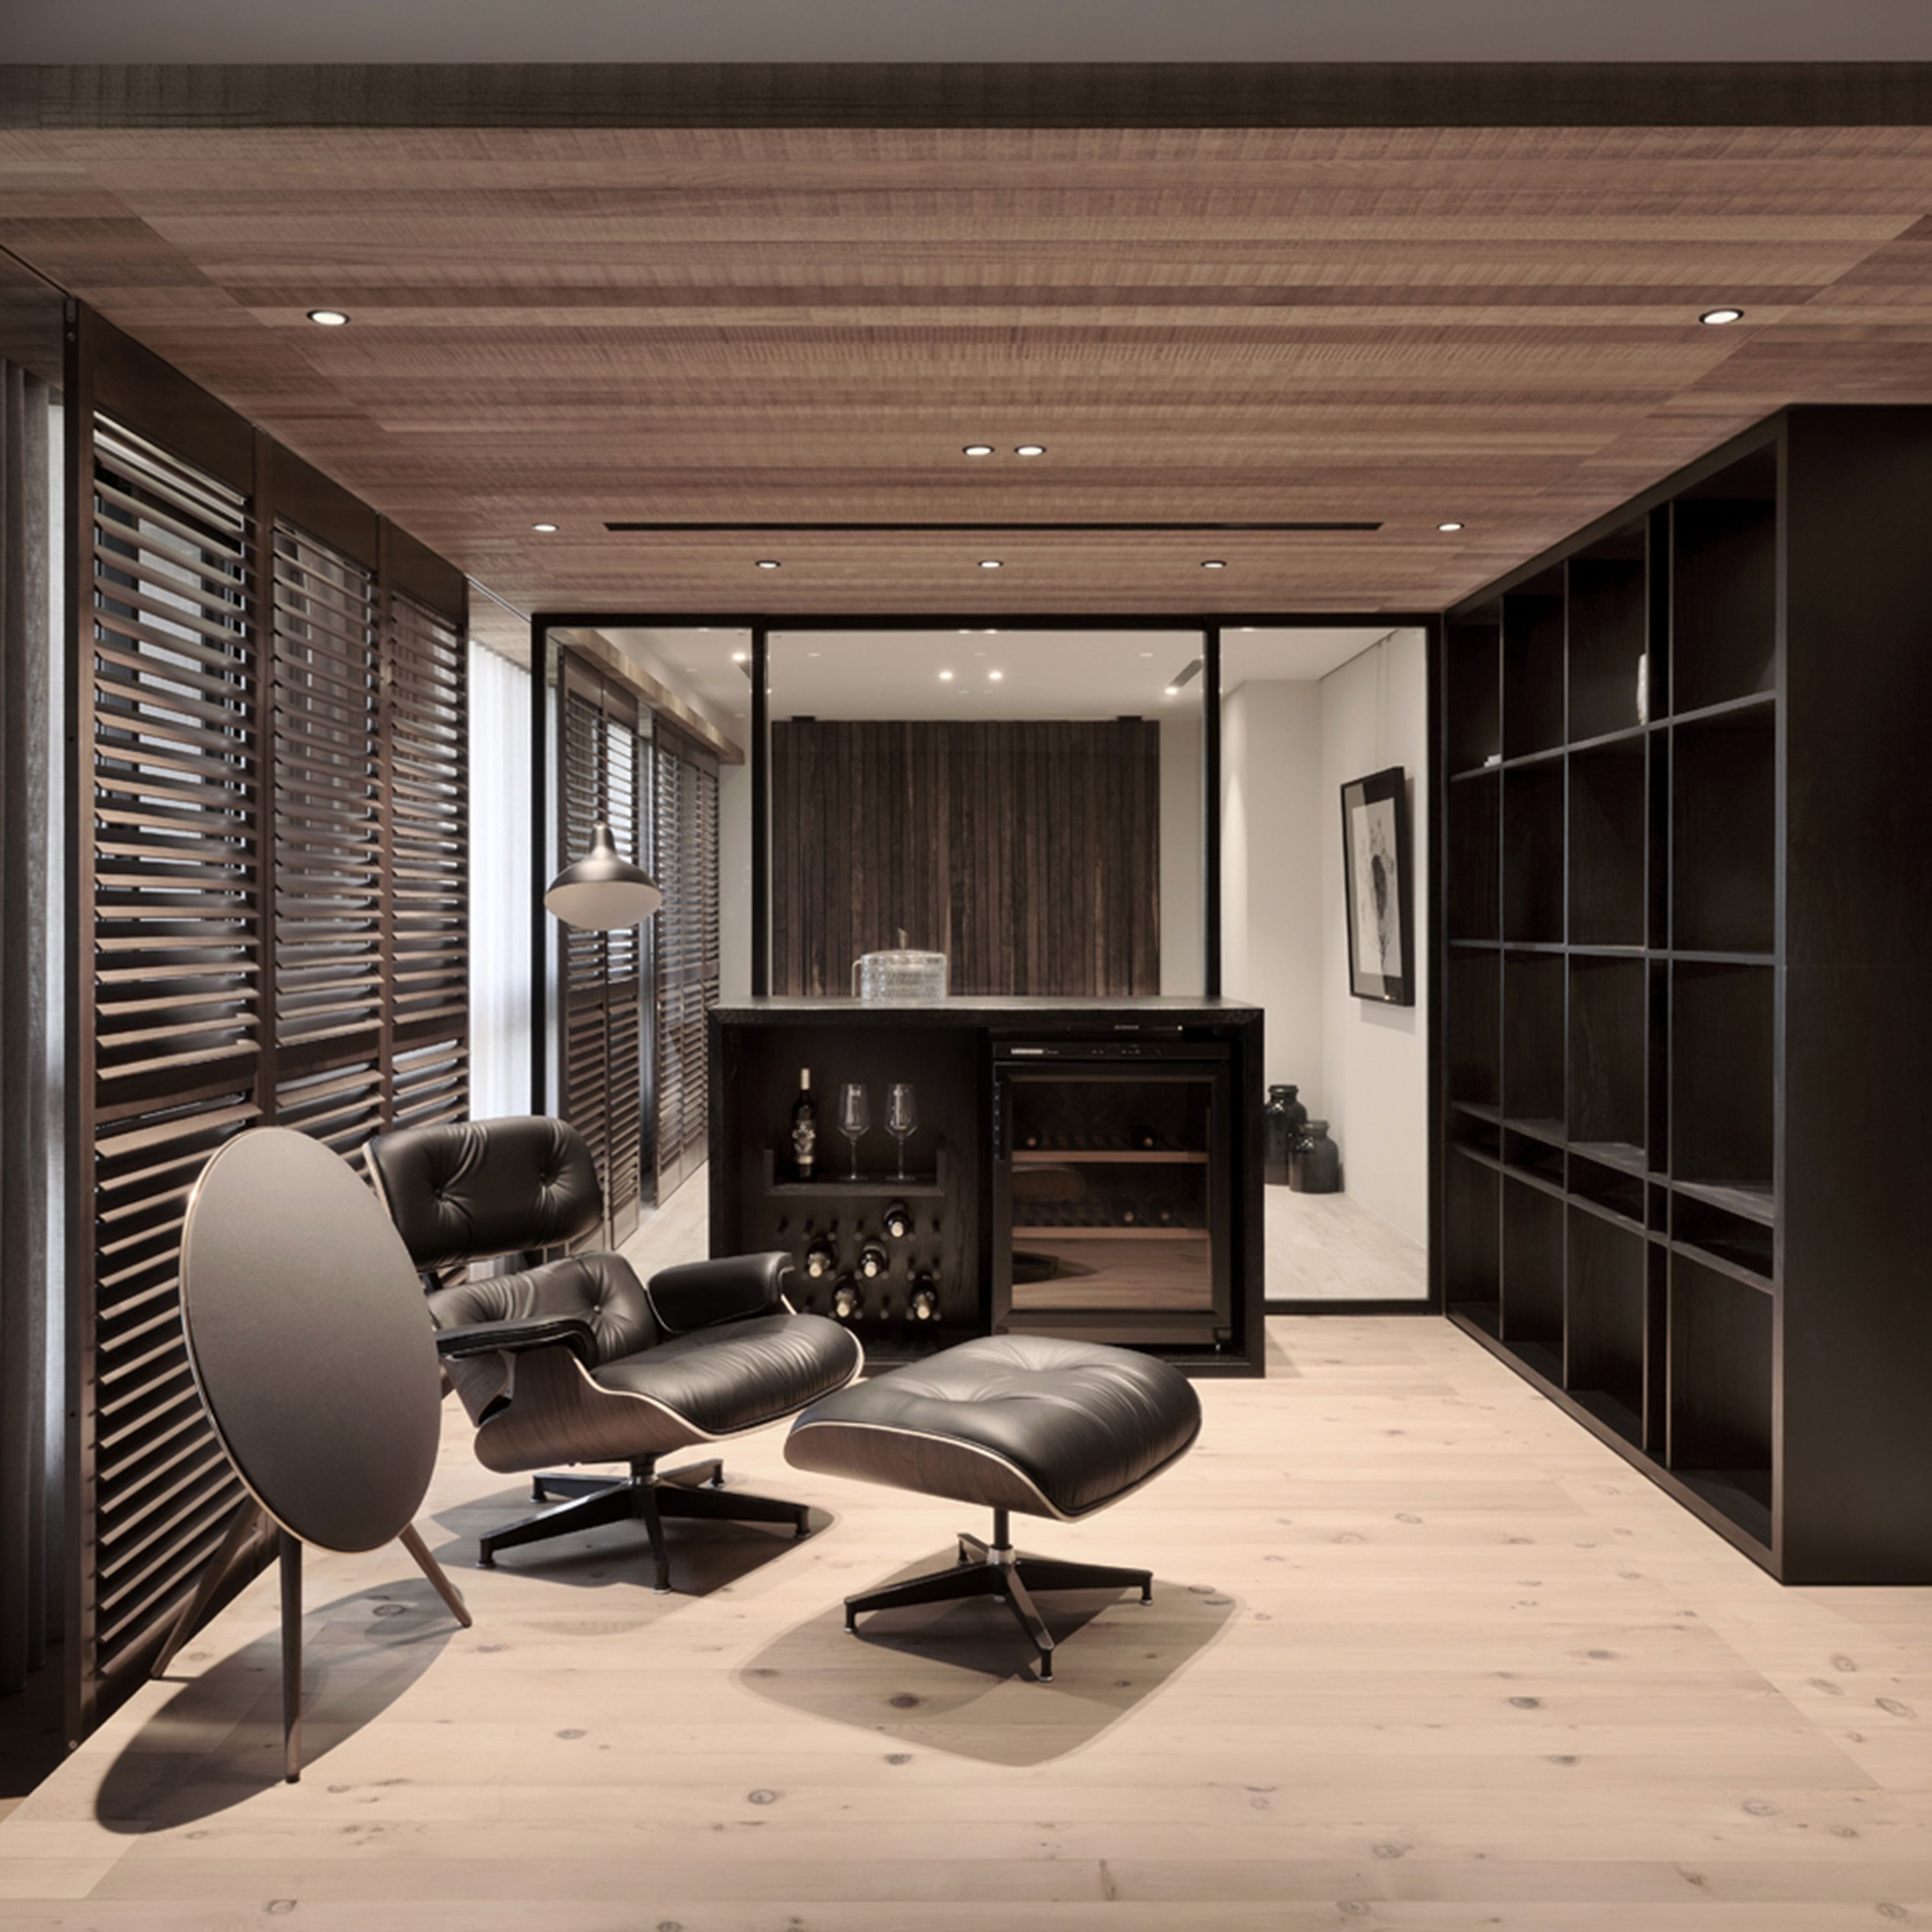 Open Space 1 3 Residential House Interior Design Awards Design Space Design